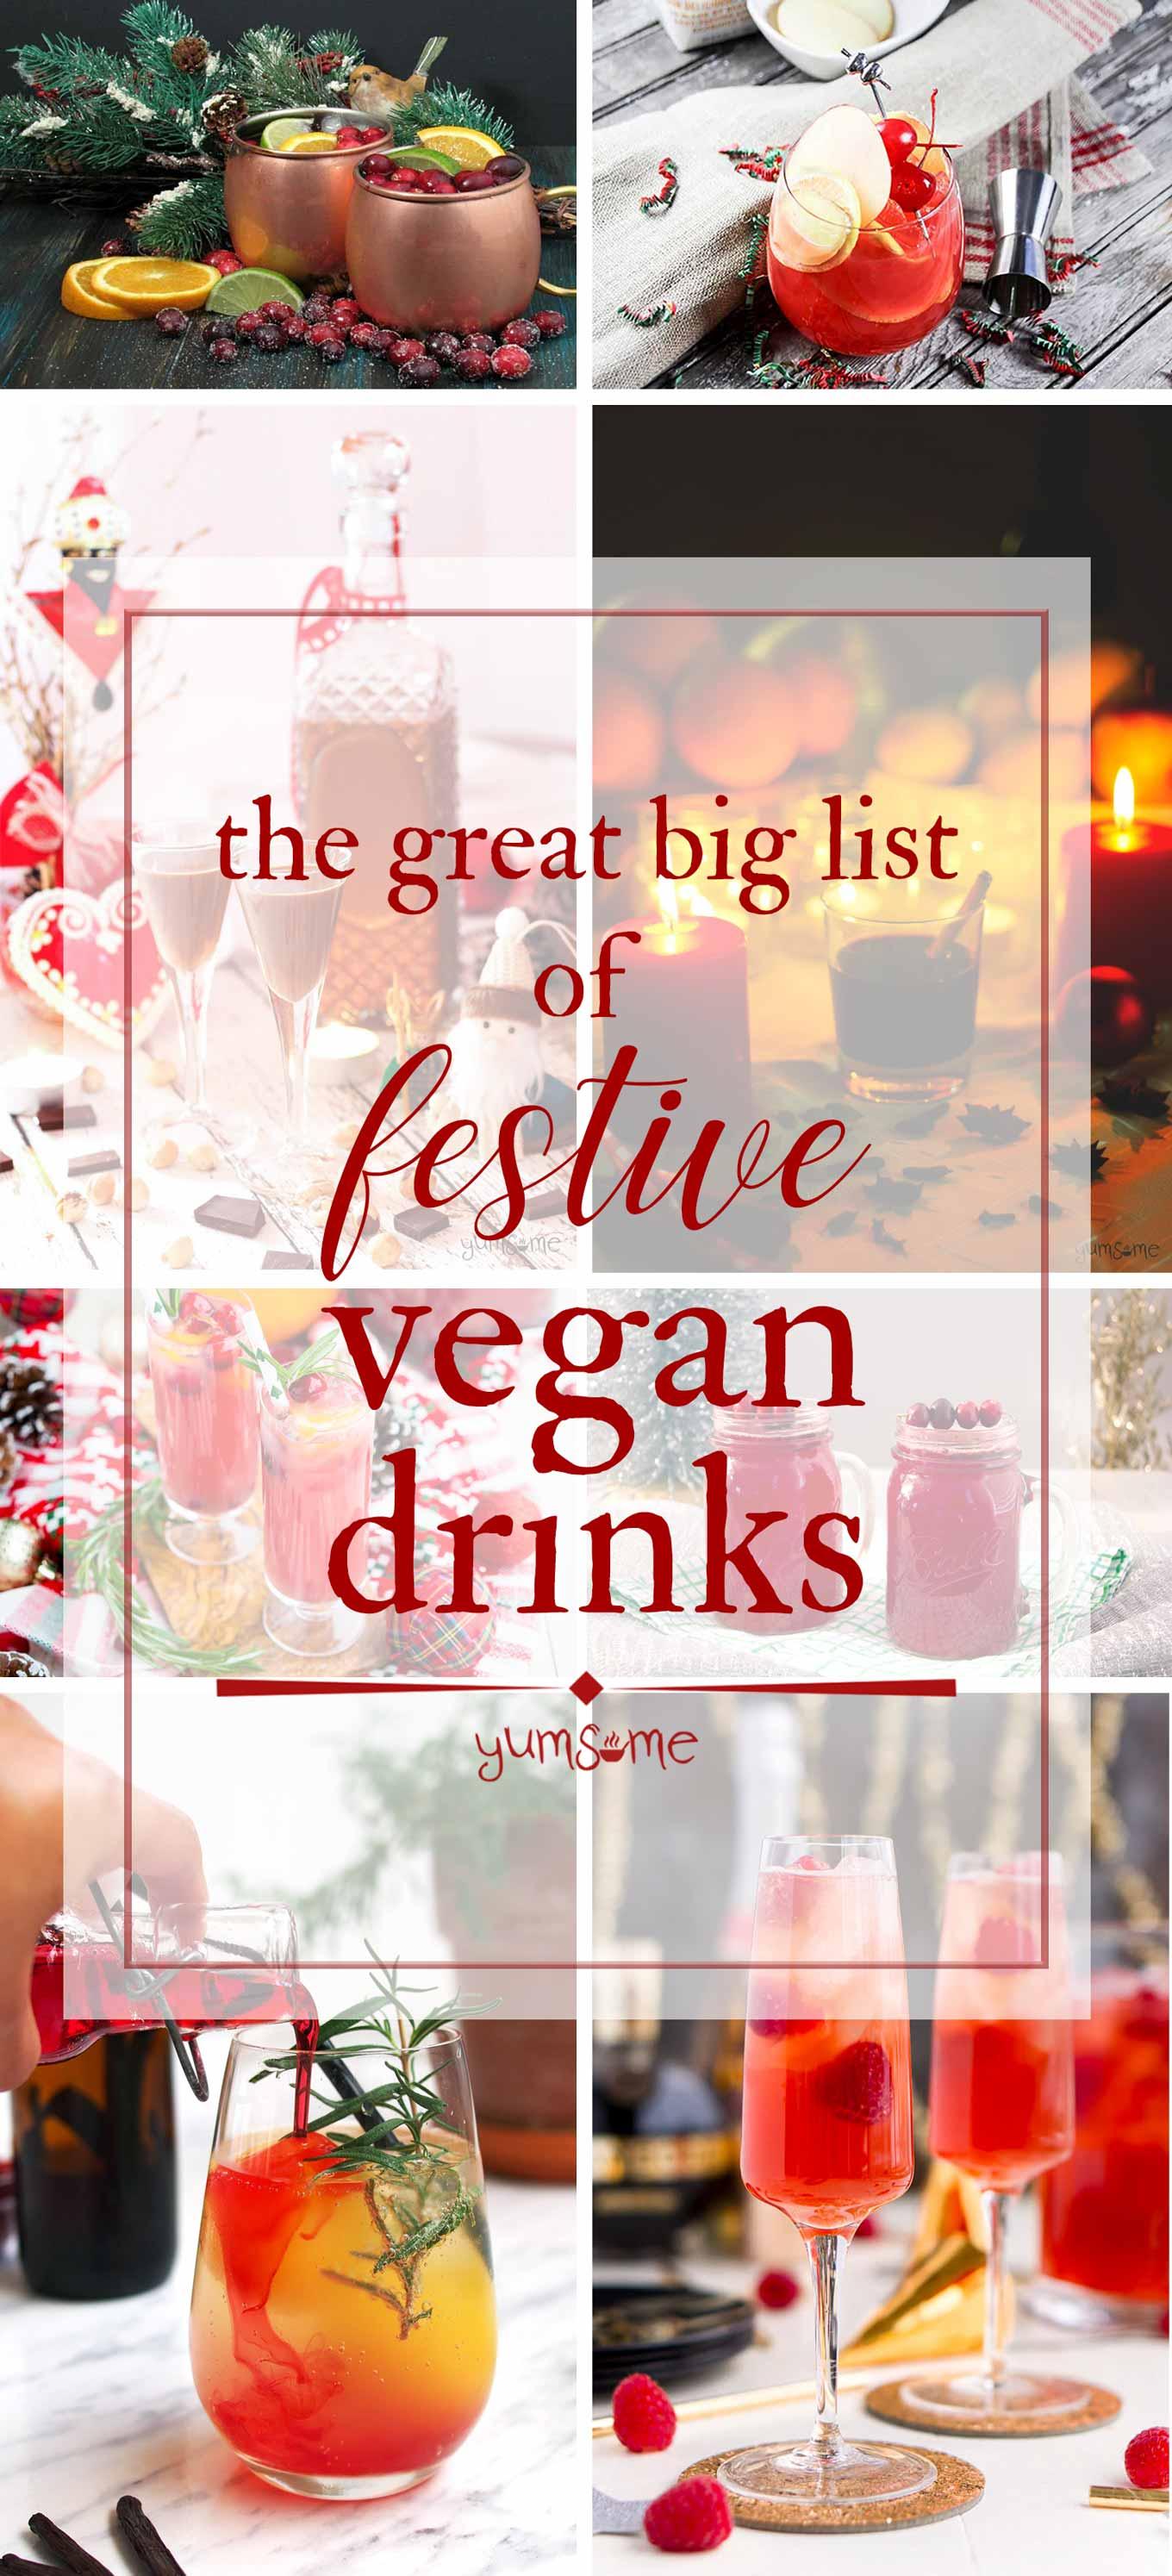 hero collage: festive vegan drinks